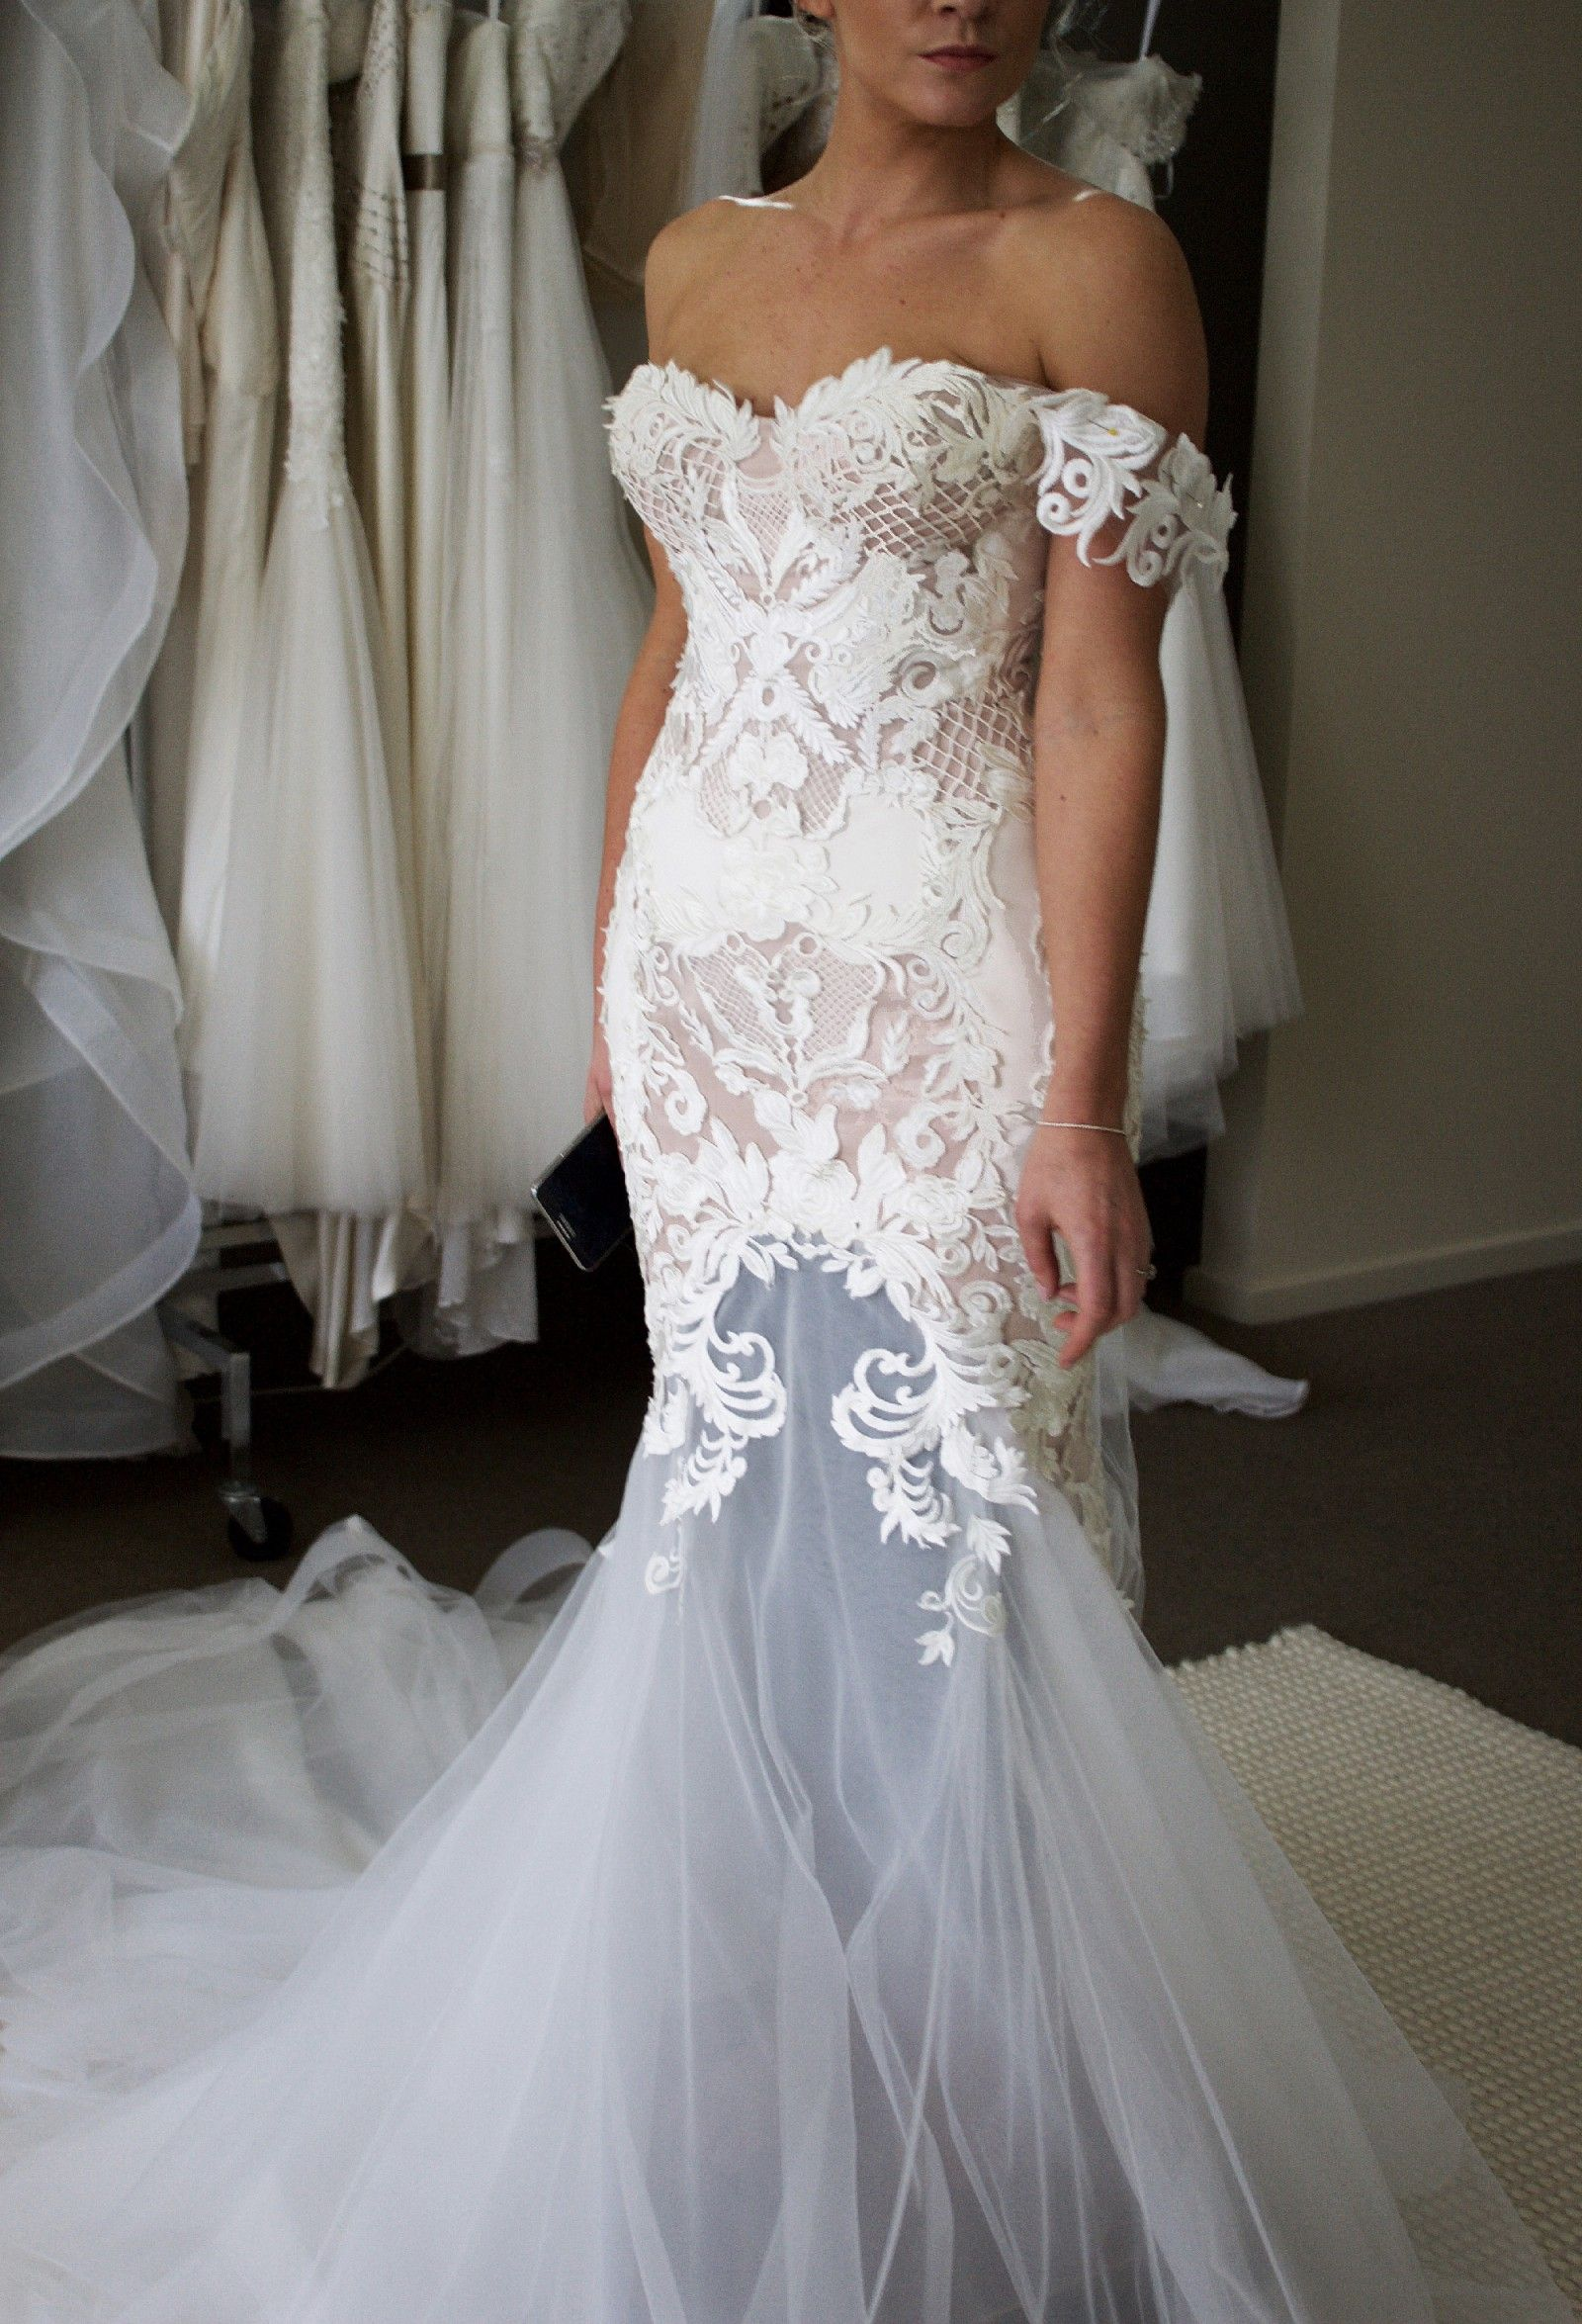 Blinova Bridal Sample Wedding Dress One Dayybe Wedding